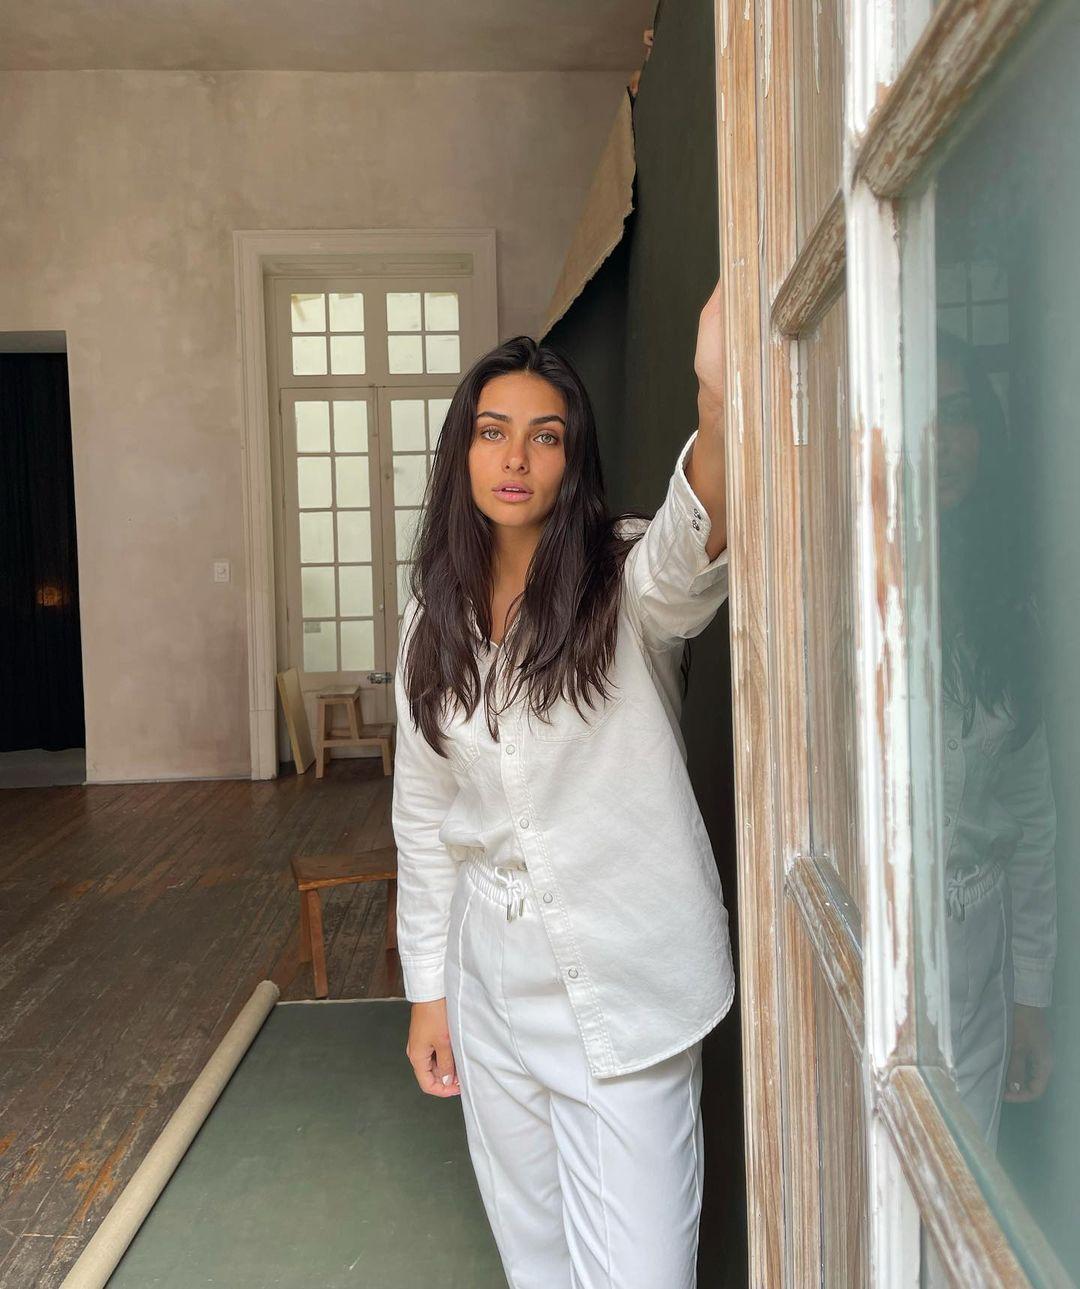 Renata-Notni-Wallpapers-Insta-Fit-Bio-5